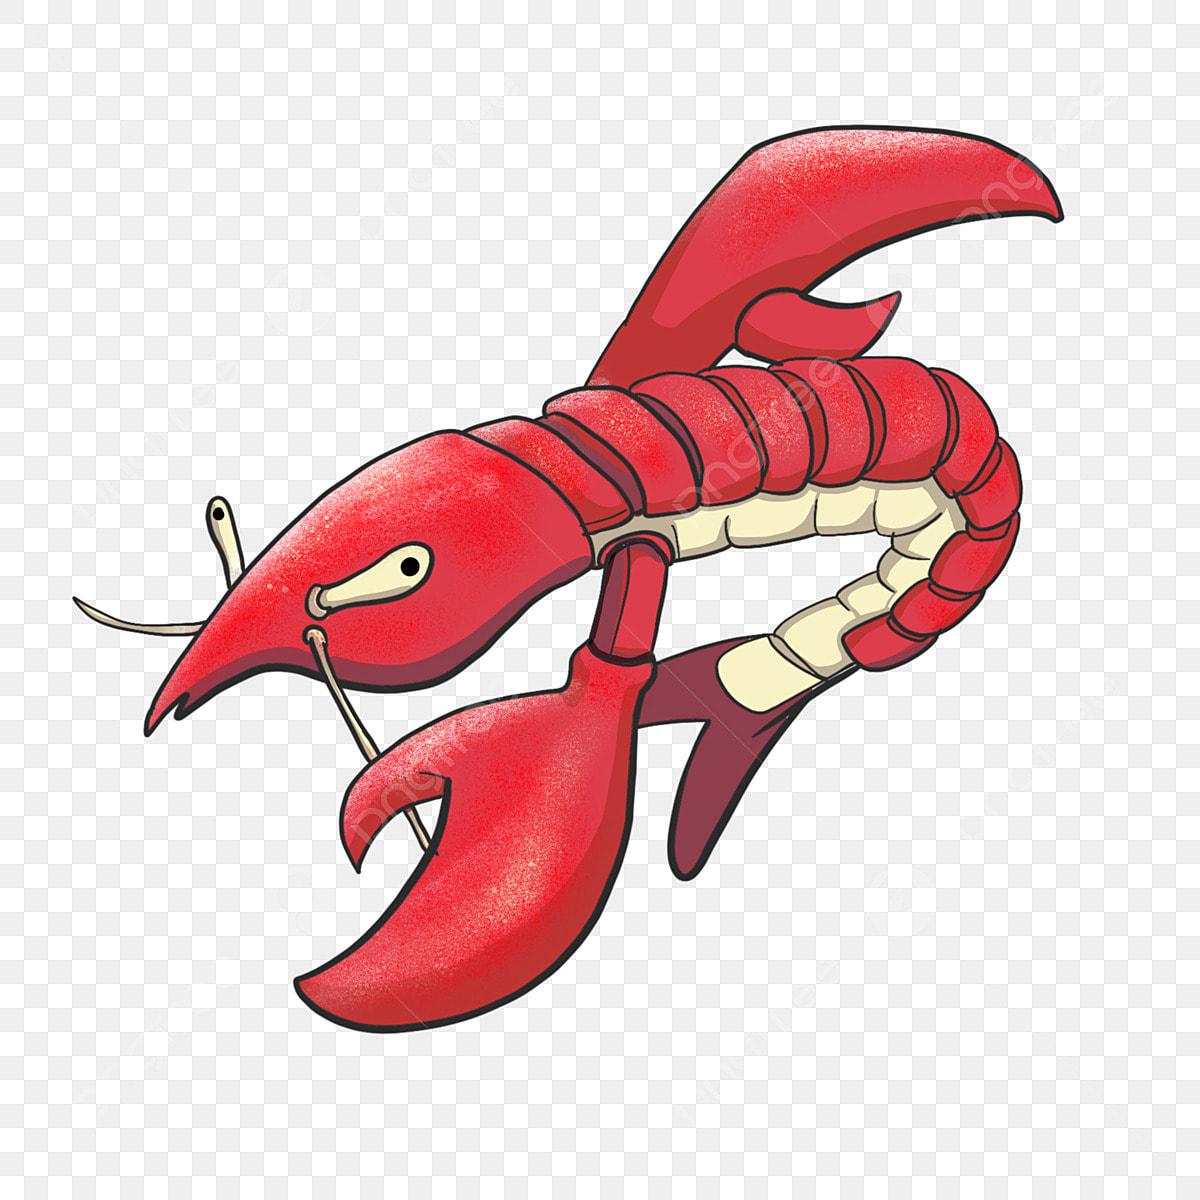 Lobster Melompat Udang Makanan Laut Segar Udang Merah Udang